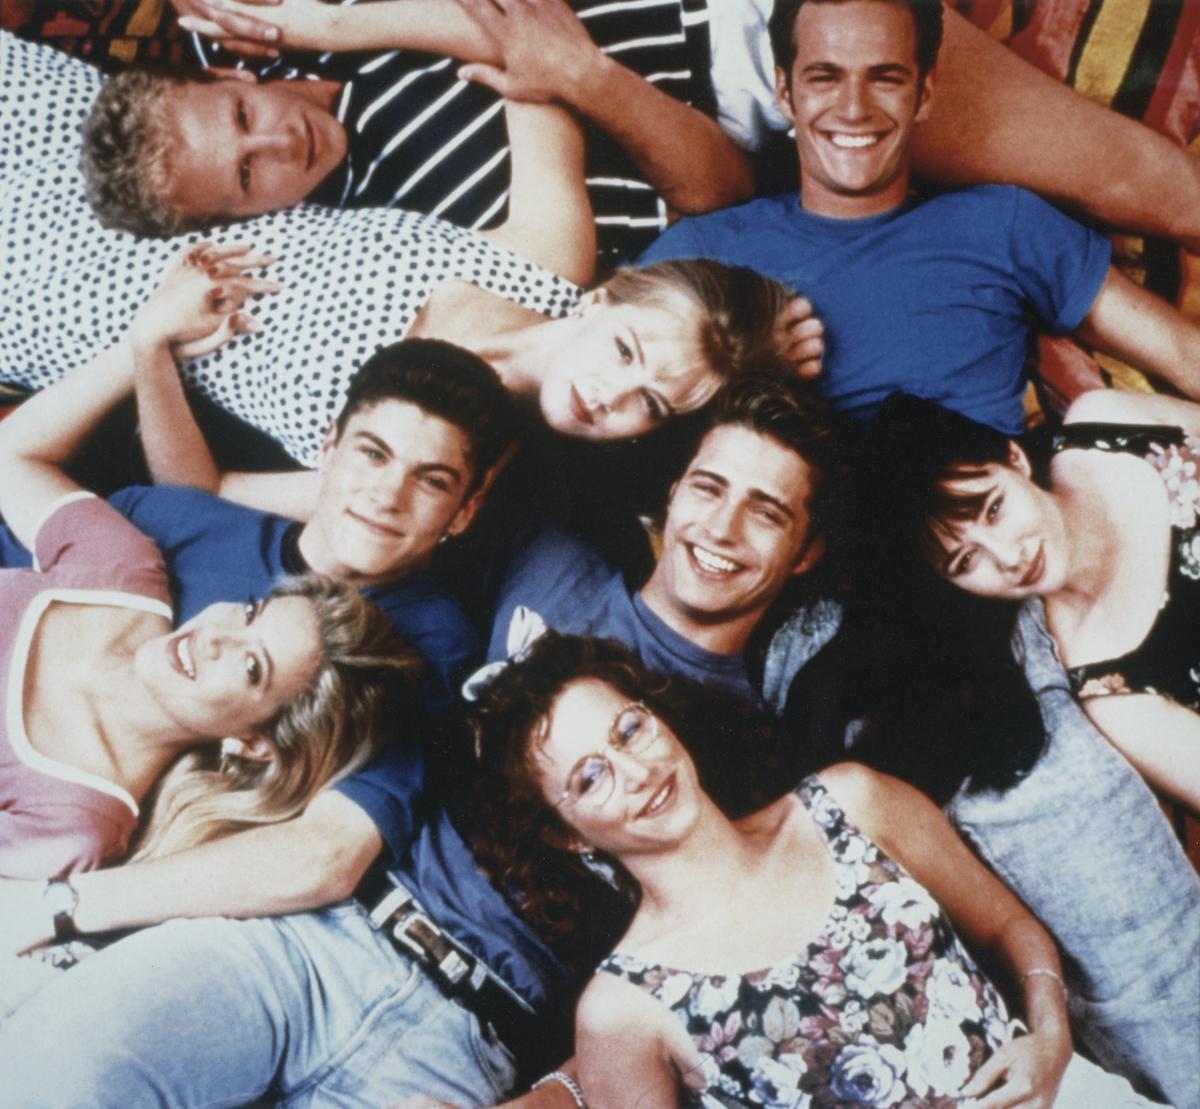 Tori Spelling, Brian Austin Green, Ian Ziering, Jennie Garth, Jason Priestley, Gabrielle Carteris, Luke Perry, Shannen Doherty